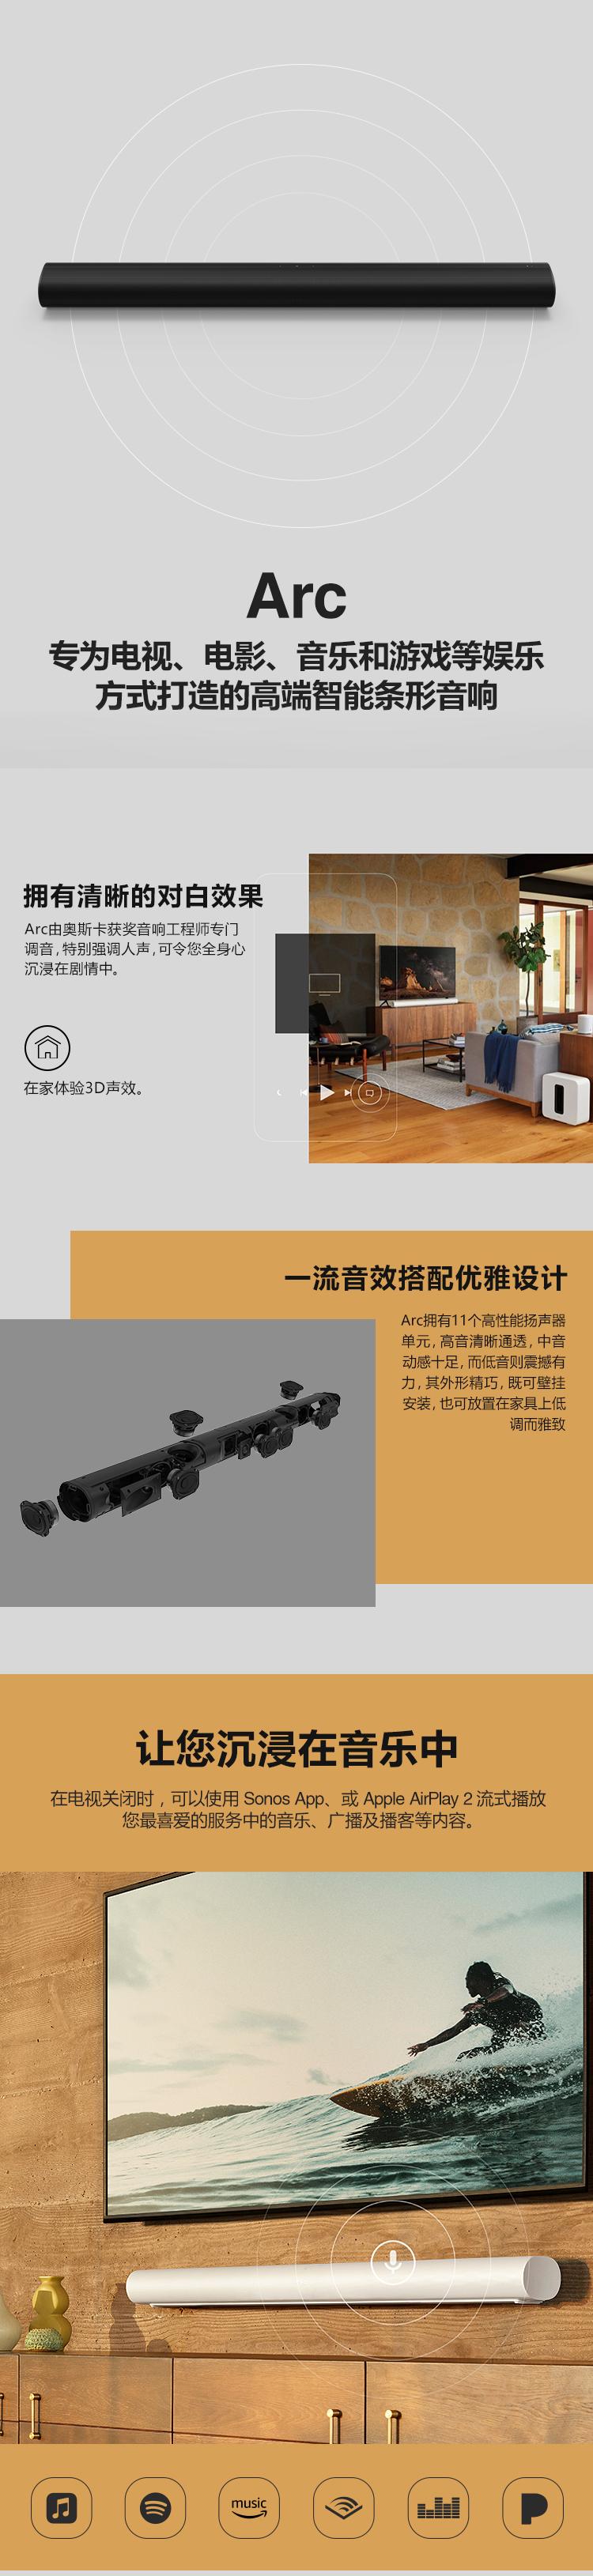 Sonos Arc高端智能条形音响免费试用,评测